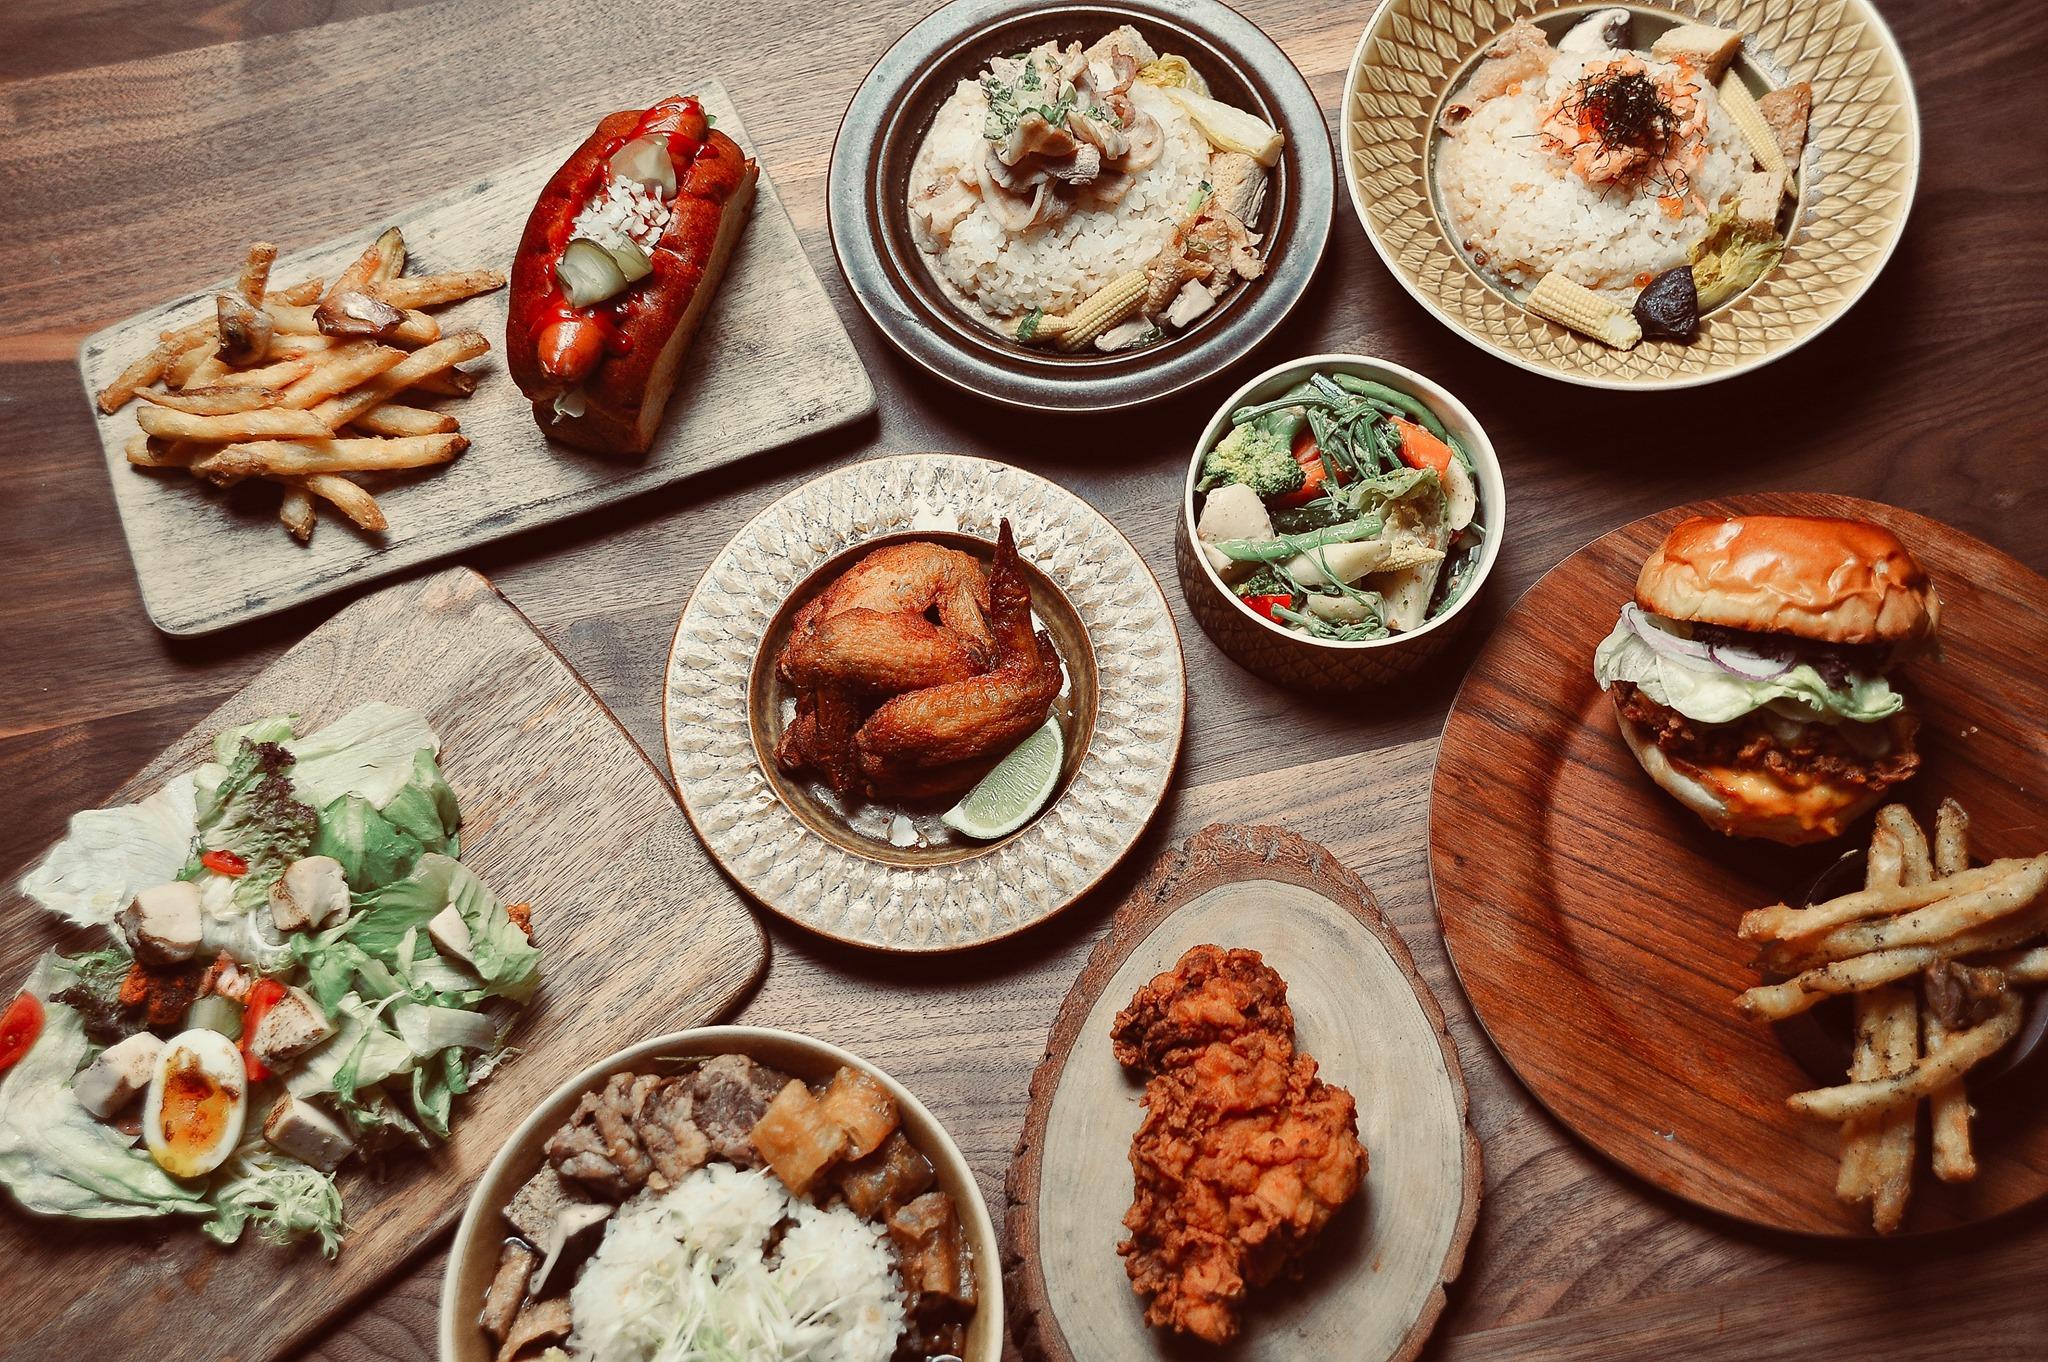 VG Express|臺北美食|人氣咖啡廳精選外送美食